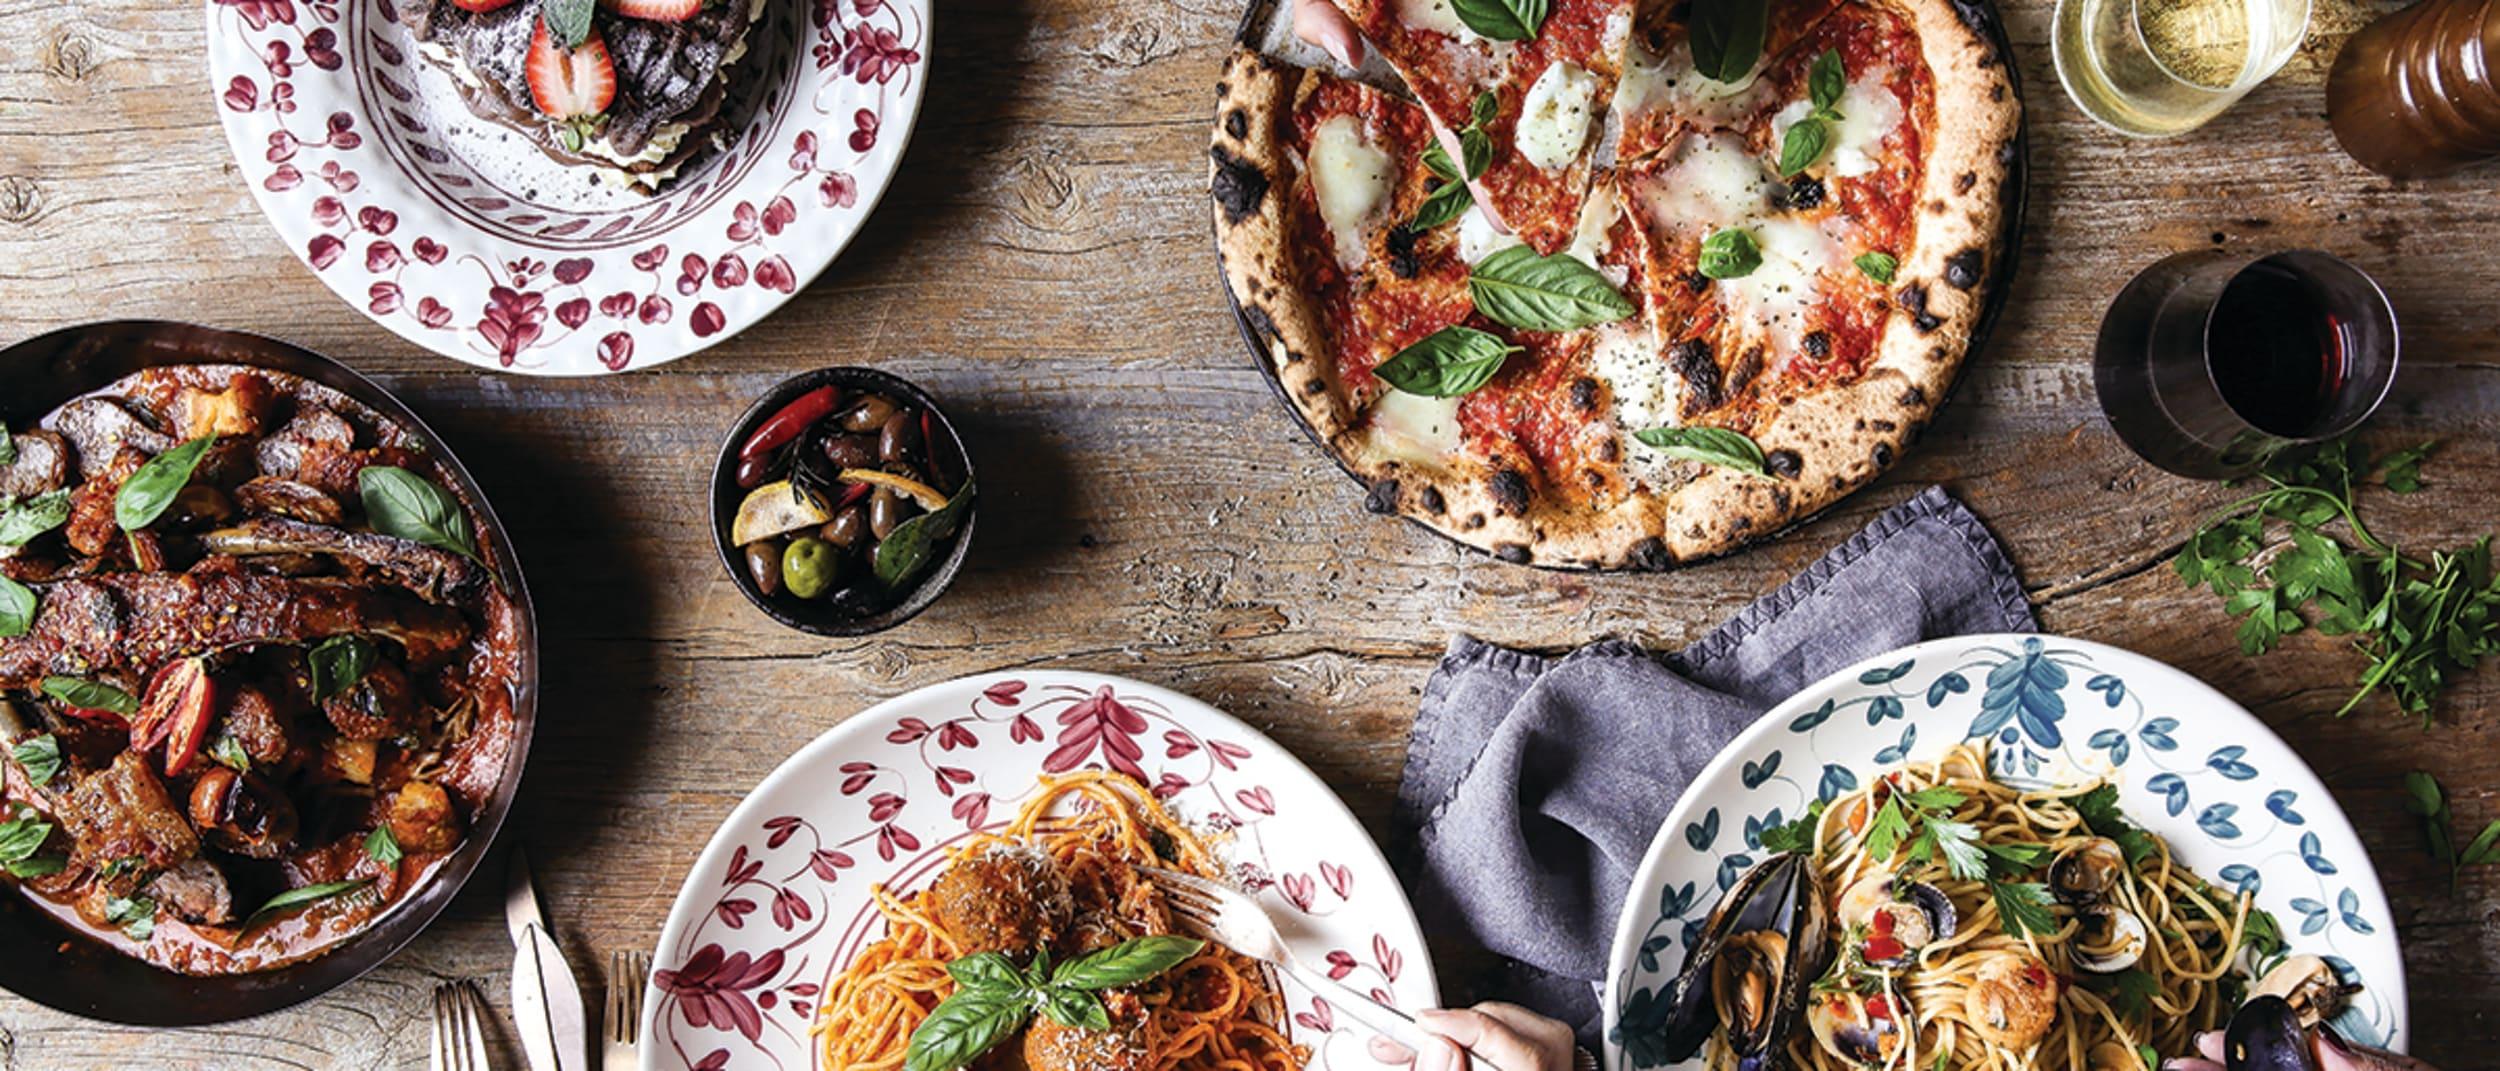 Criniti's: your new Italian go-to is here